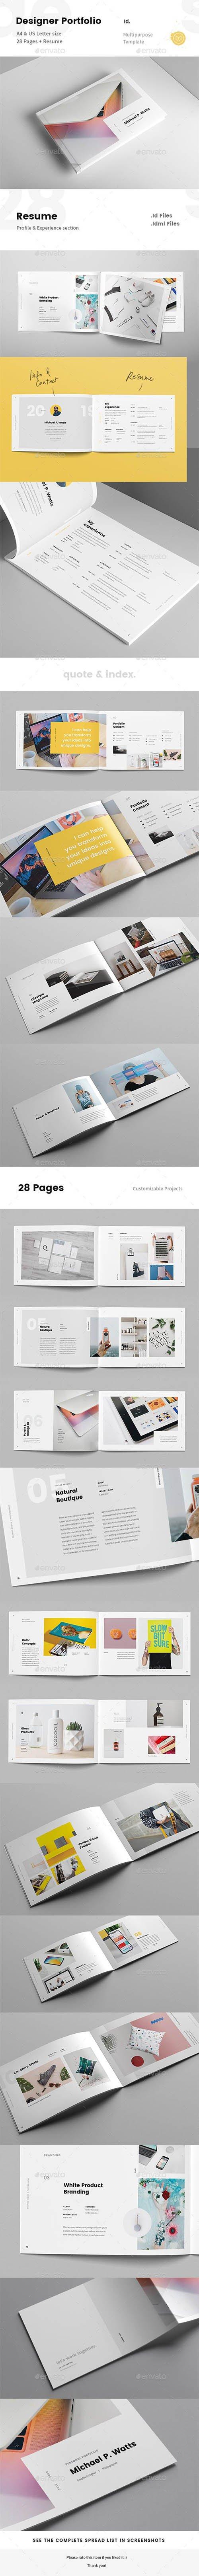 GraphicRiver - Landscape Creative Portfolio for Designers with Resume 23021146